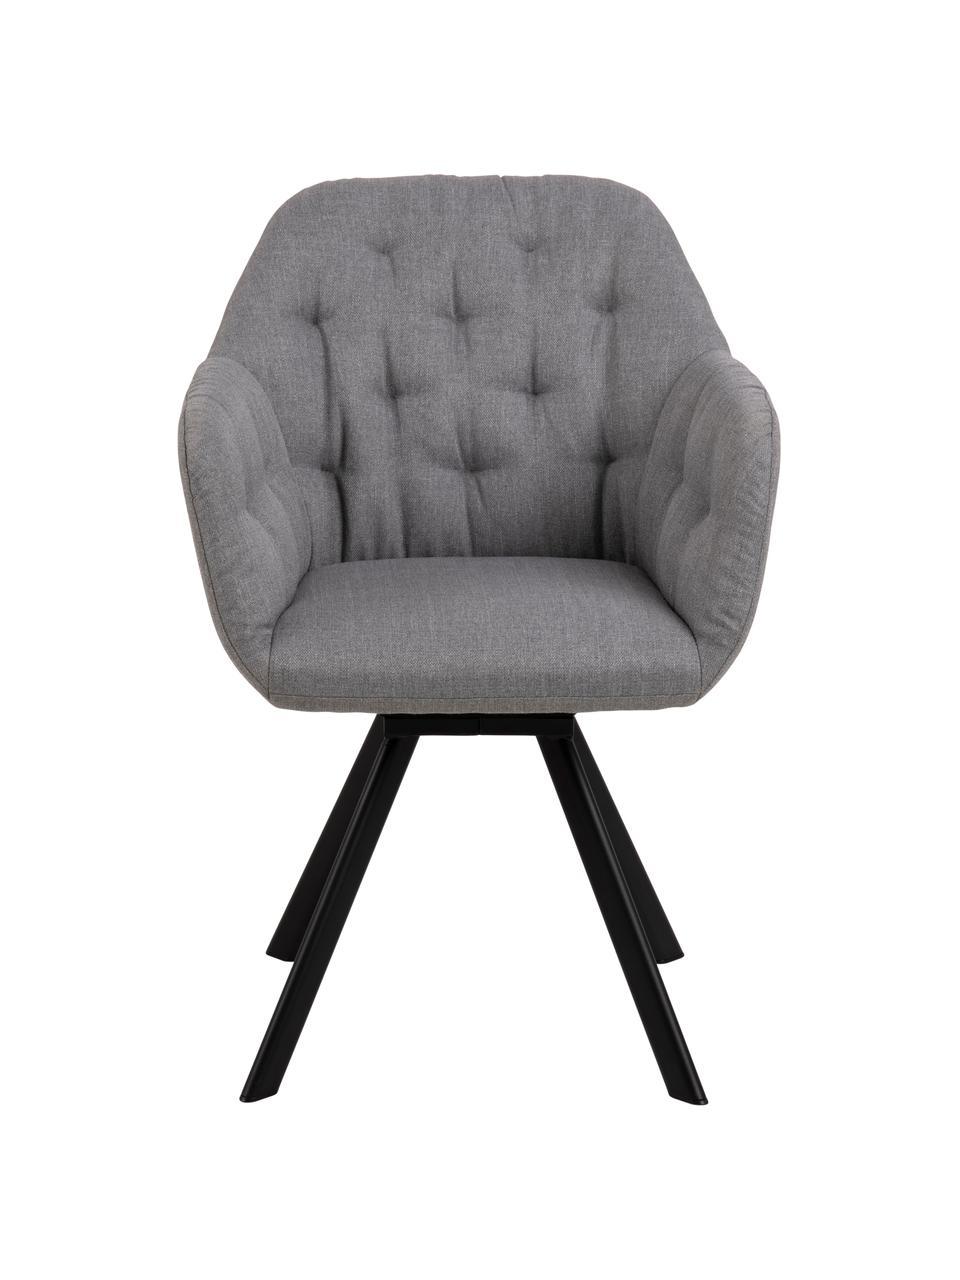 Drehbarer Armlehnstuhl Lucie, Bezug: Polyester, Beine: Metall, lackiert, Webstoff Hellgrau, B 58 x T 62 cm